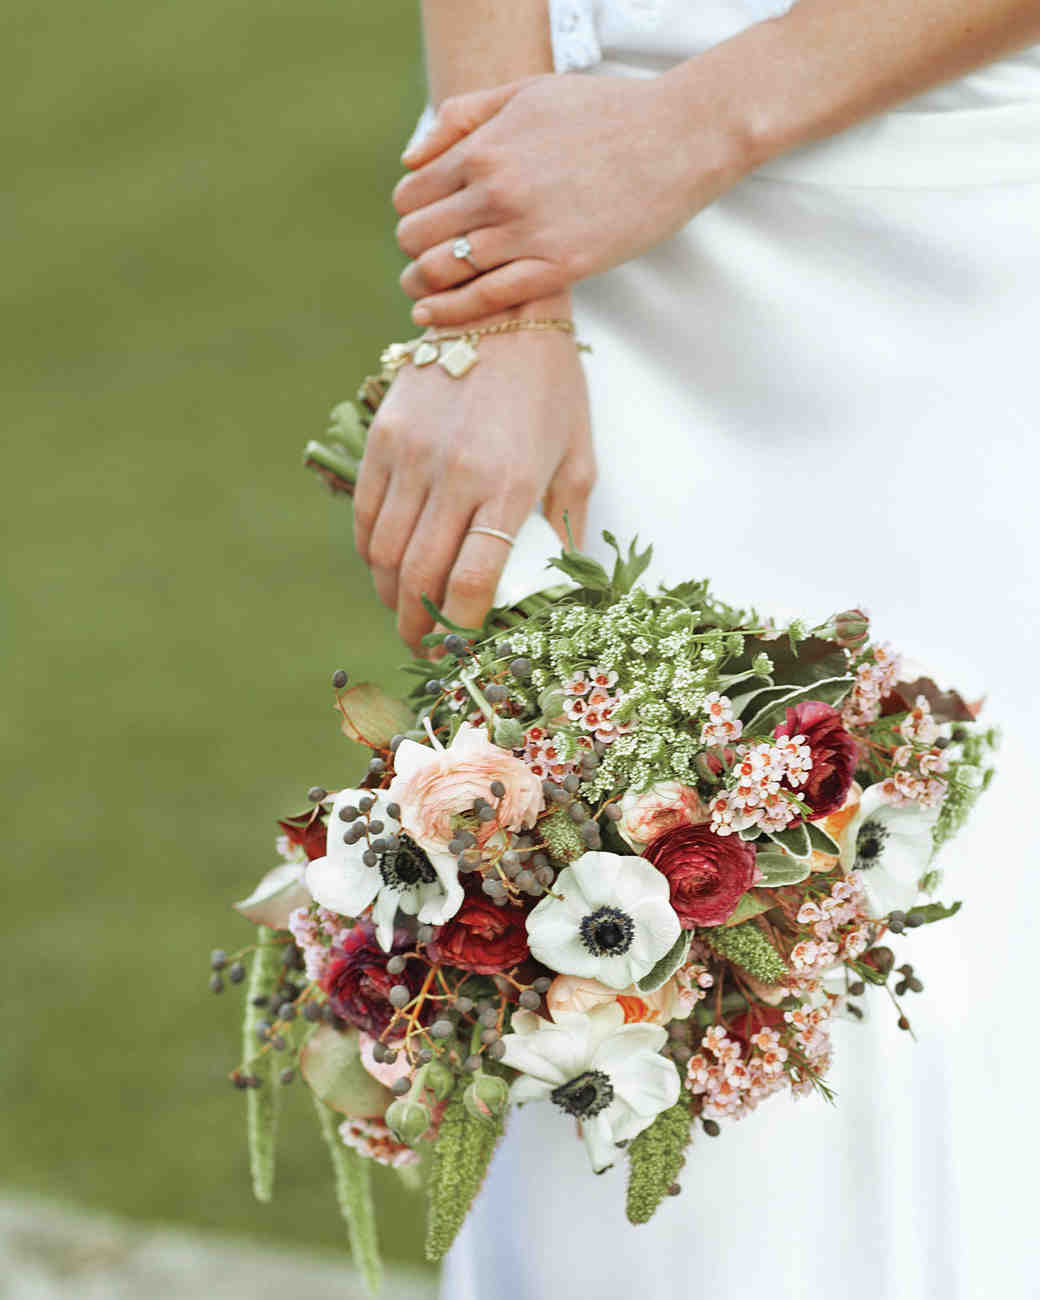 Wedding Planning, Wedding Planning Tips and Tricks, How to Plan Your Wedding, Wedding Planning TIps and Tricks, Plan Your Wedding at Work, Popular Pin